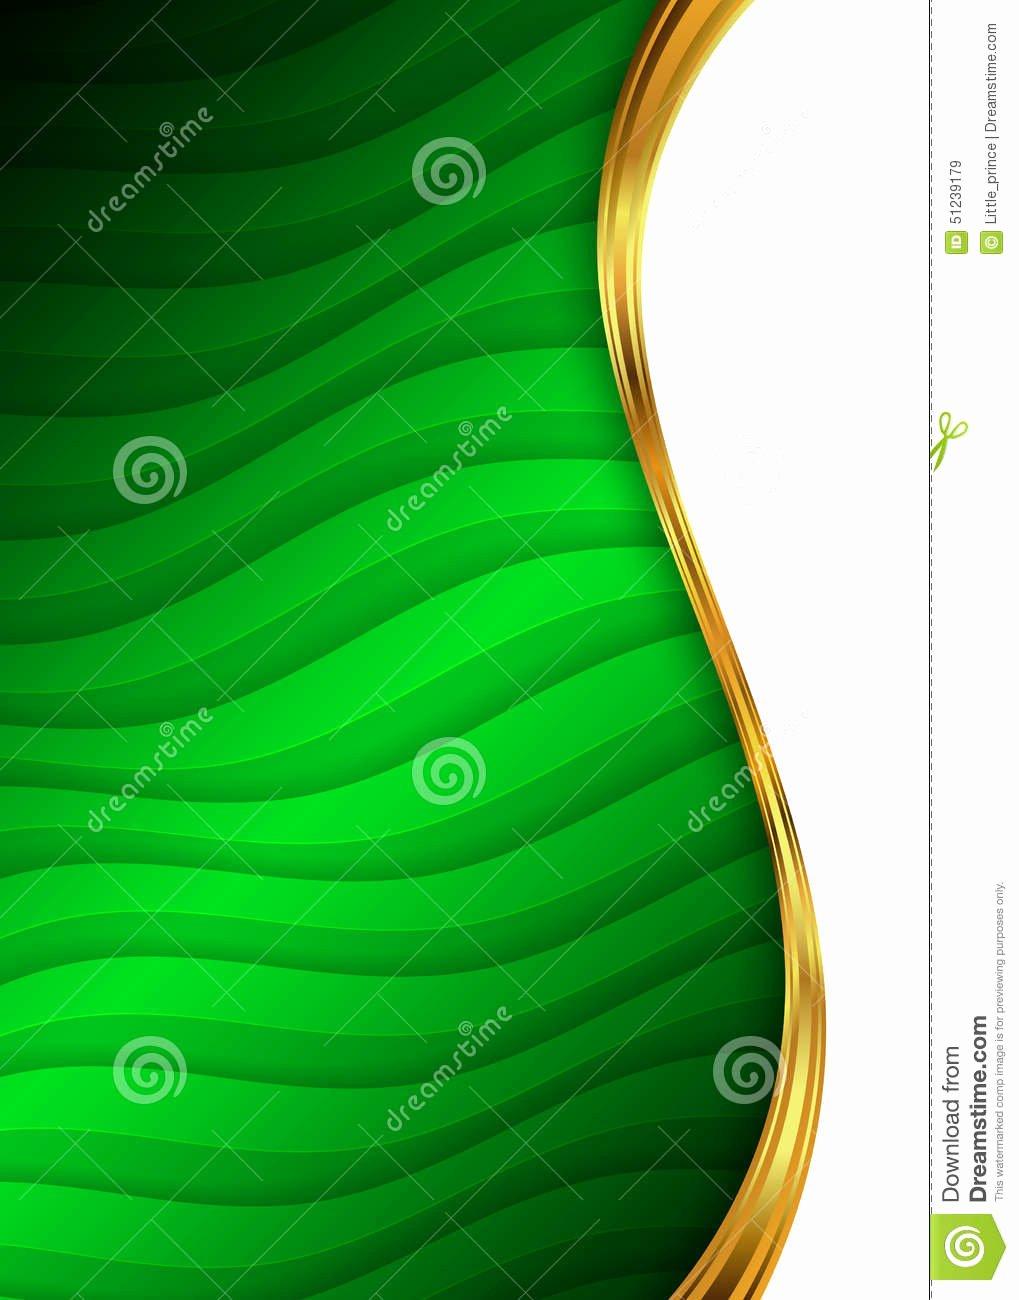 Video Background Website Template Fresh Green and Gold Abstract Background Template for Website